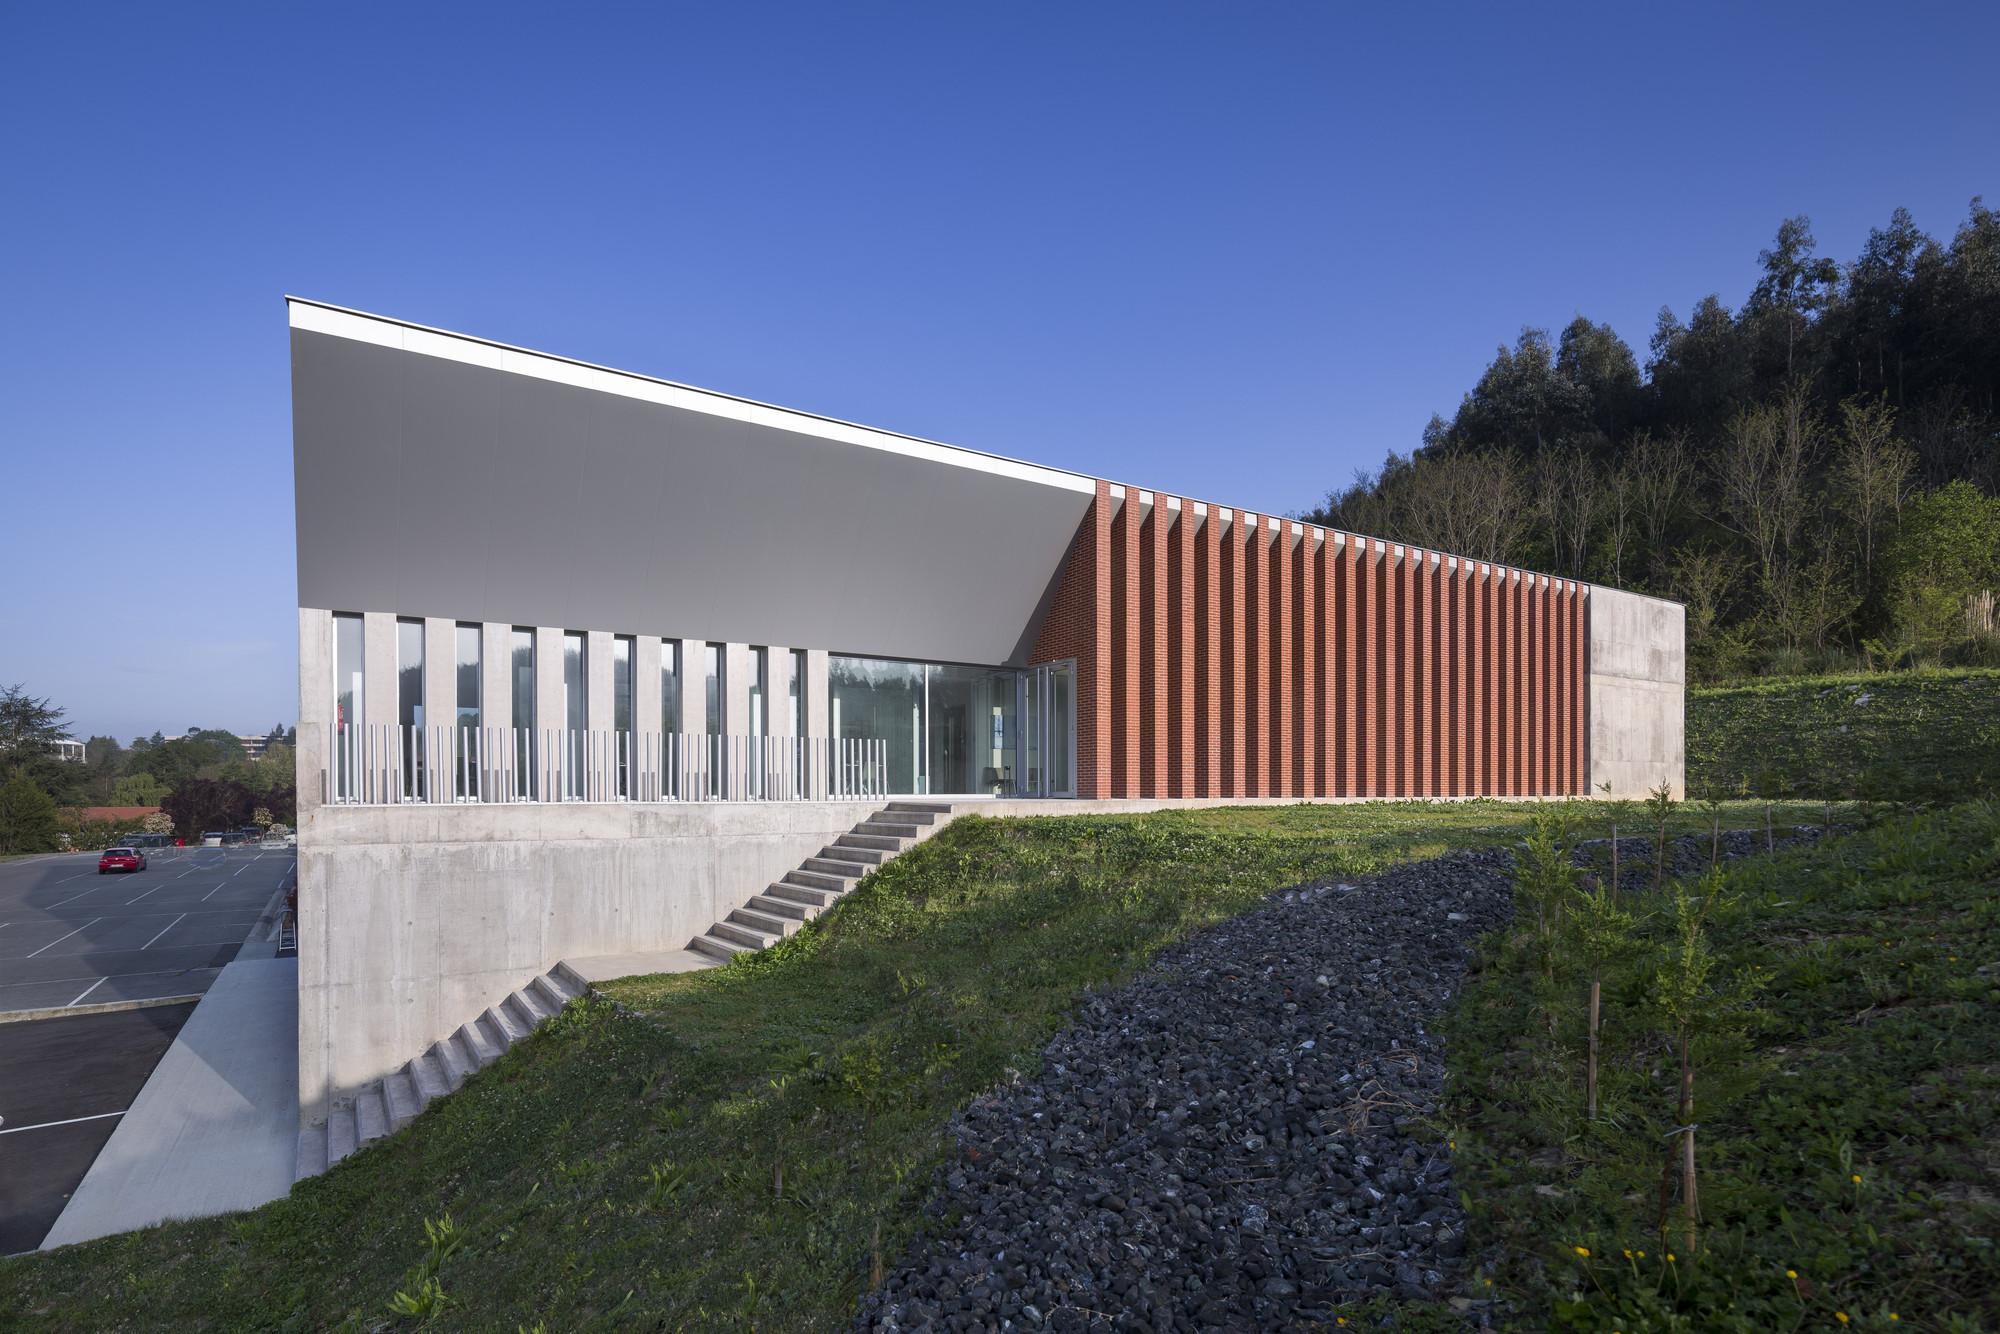 COAS Offices and Headquarters / Otxotorena Arquitectos, © Rubén Pérez Bescós